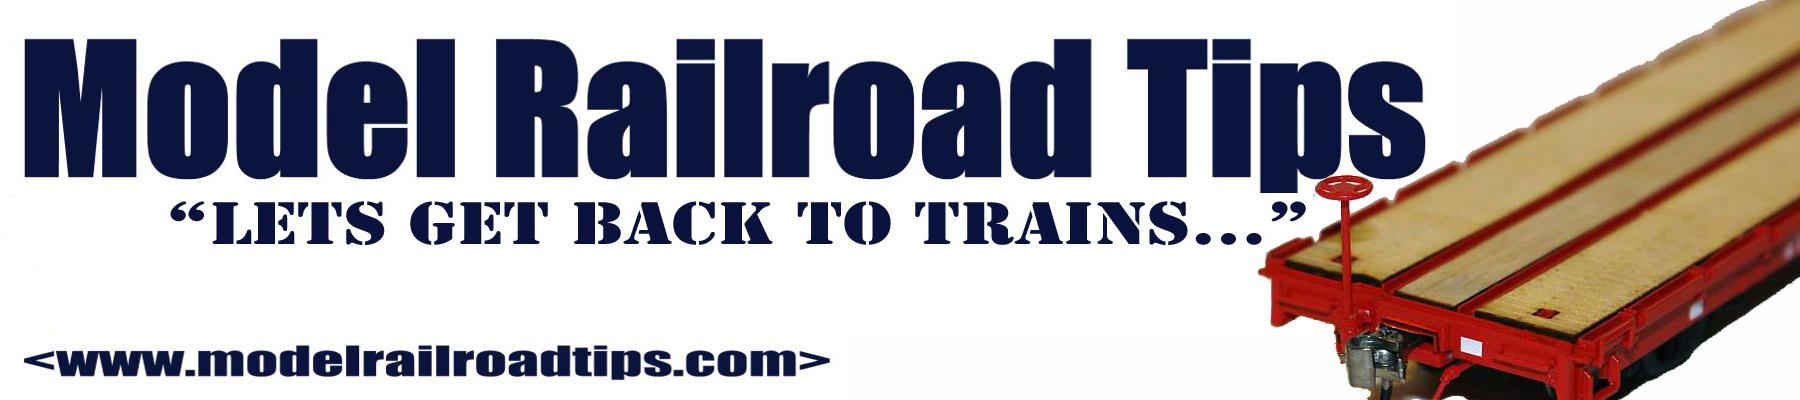 Model Railroad Tips 2.0